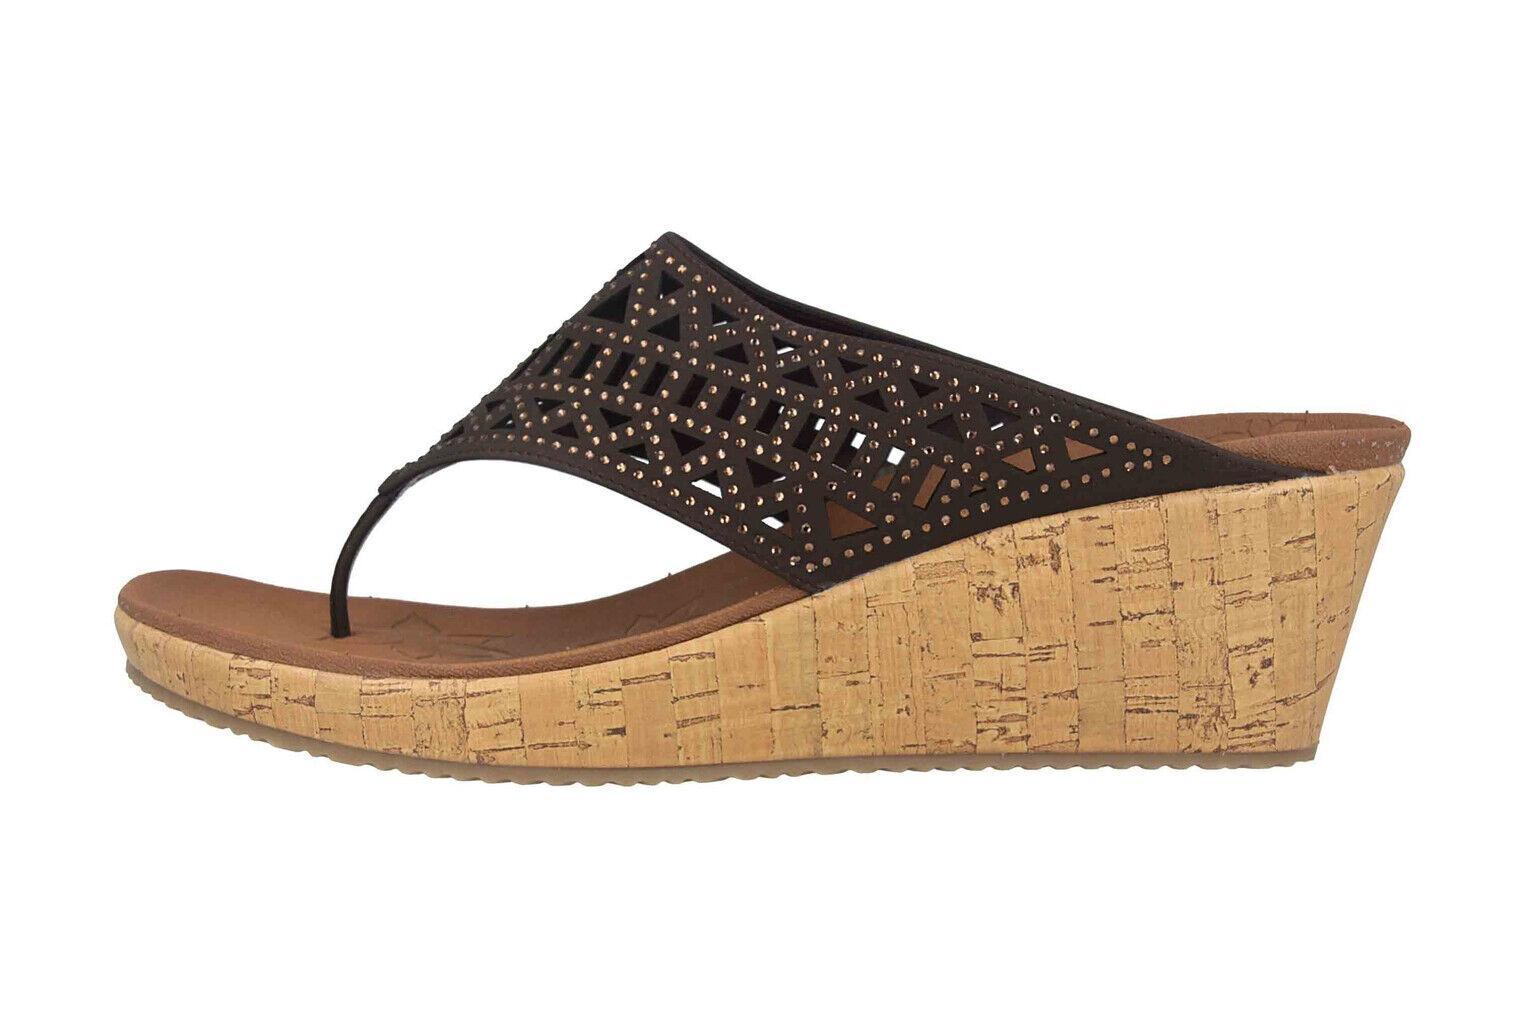 Skechers beverlee-Summer visit tira dedo en talla extragrande marrón 31715 choc grandes